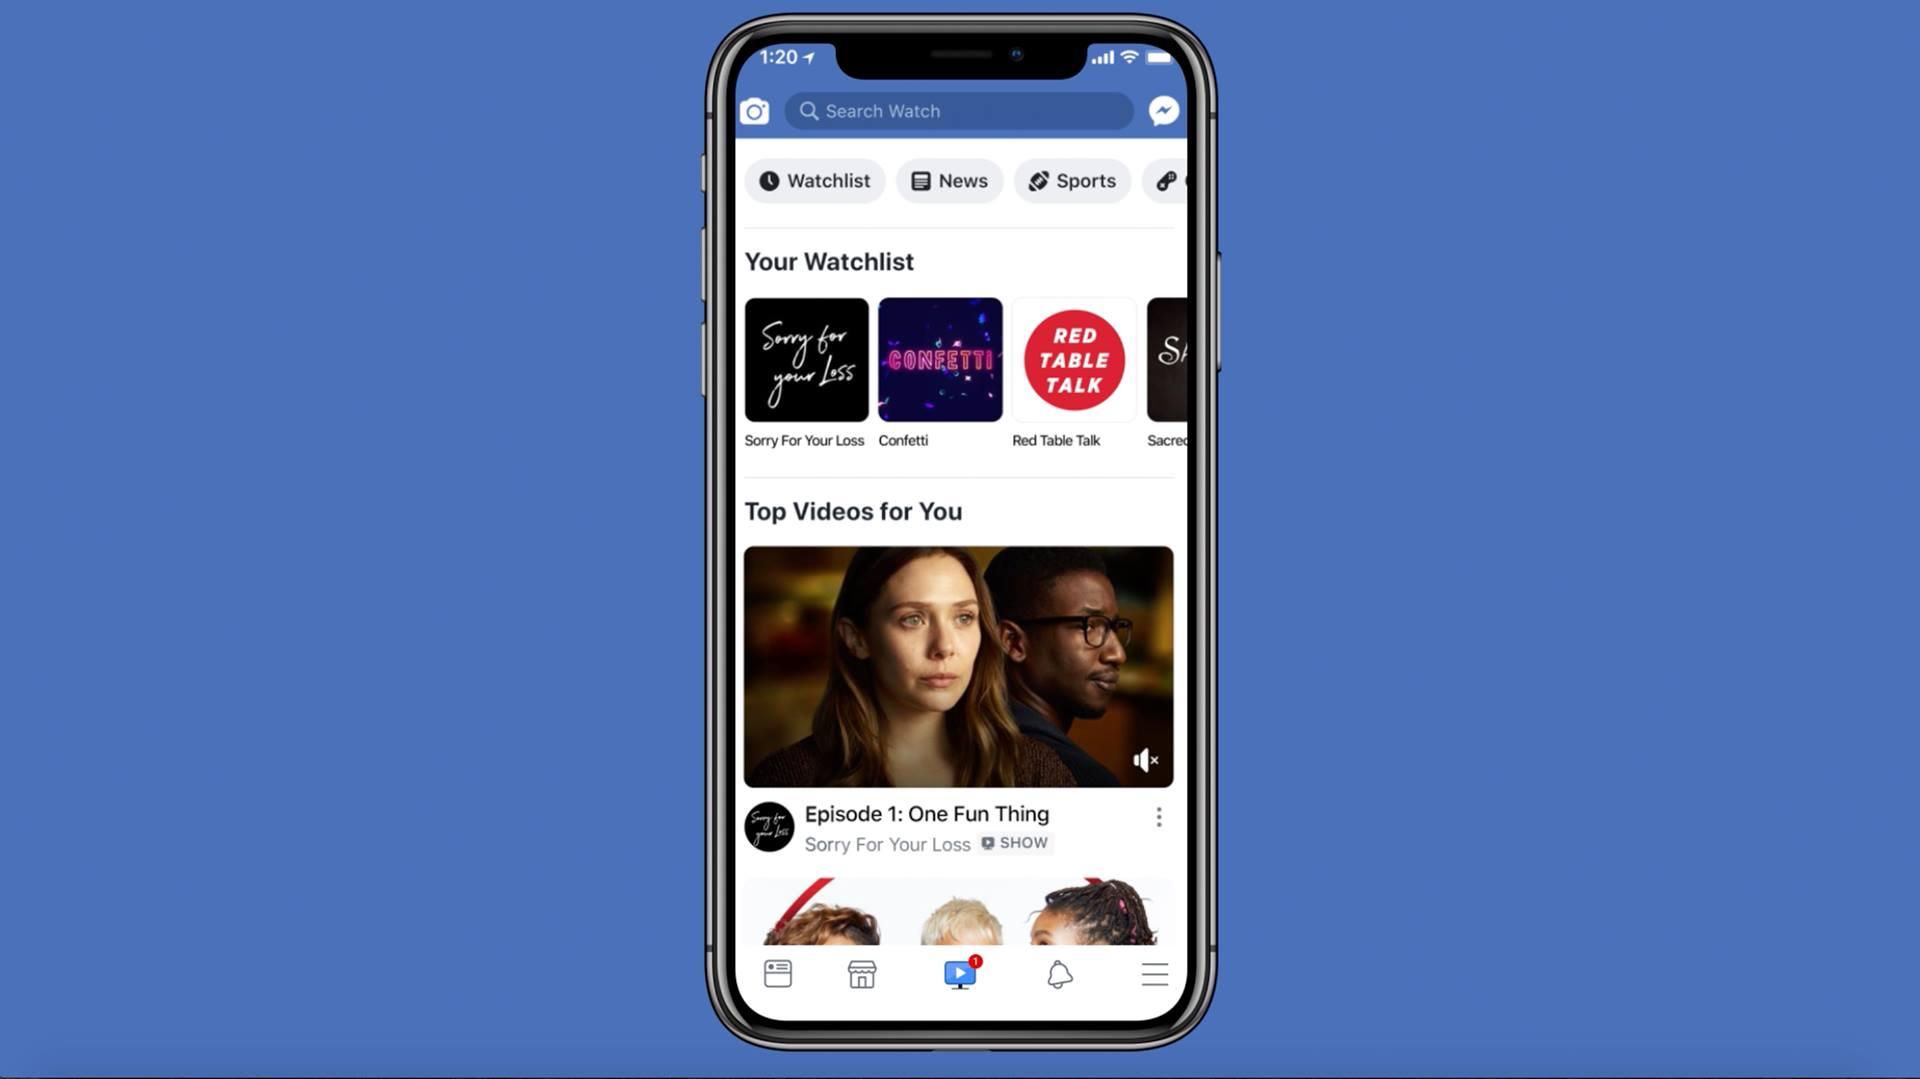 Facebook Watch, as seen on a smartphone.